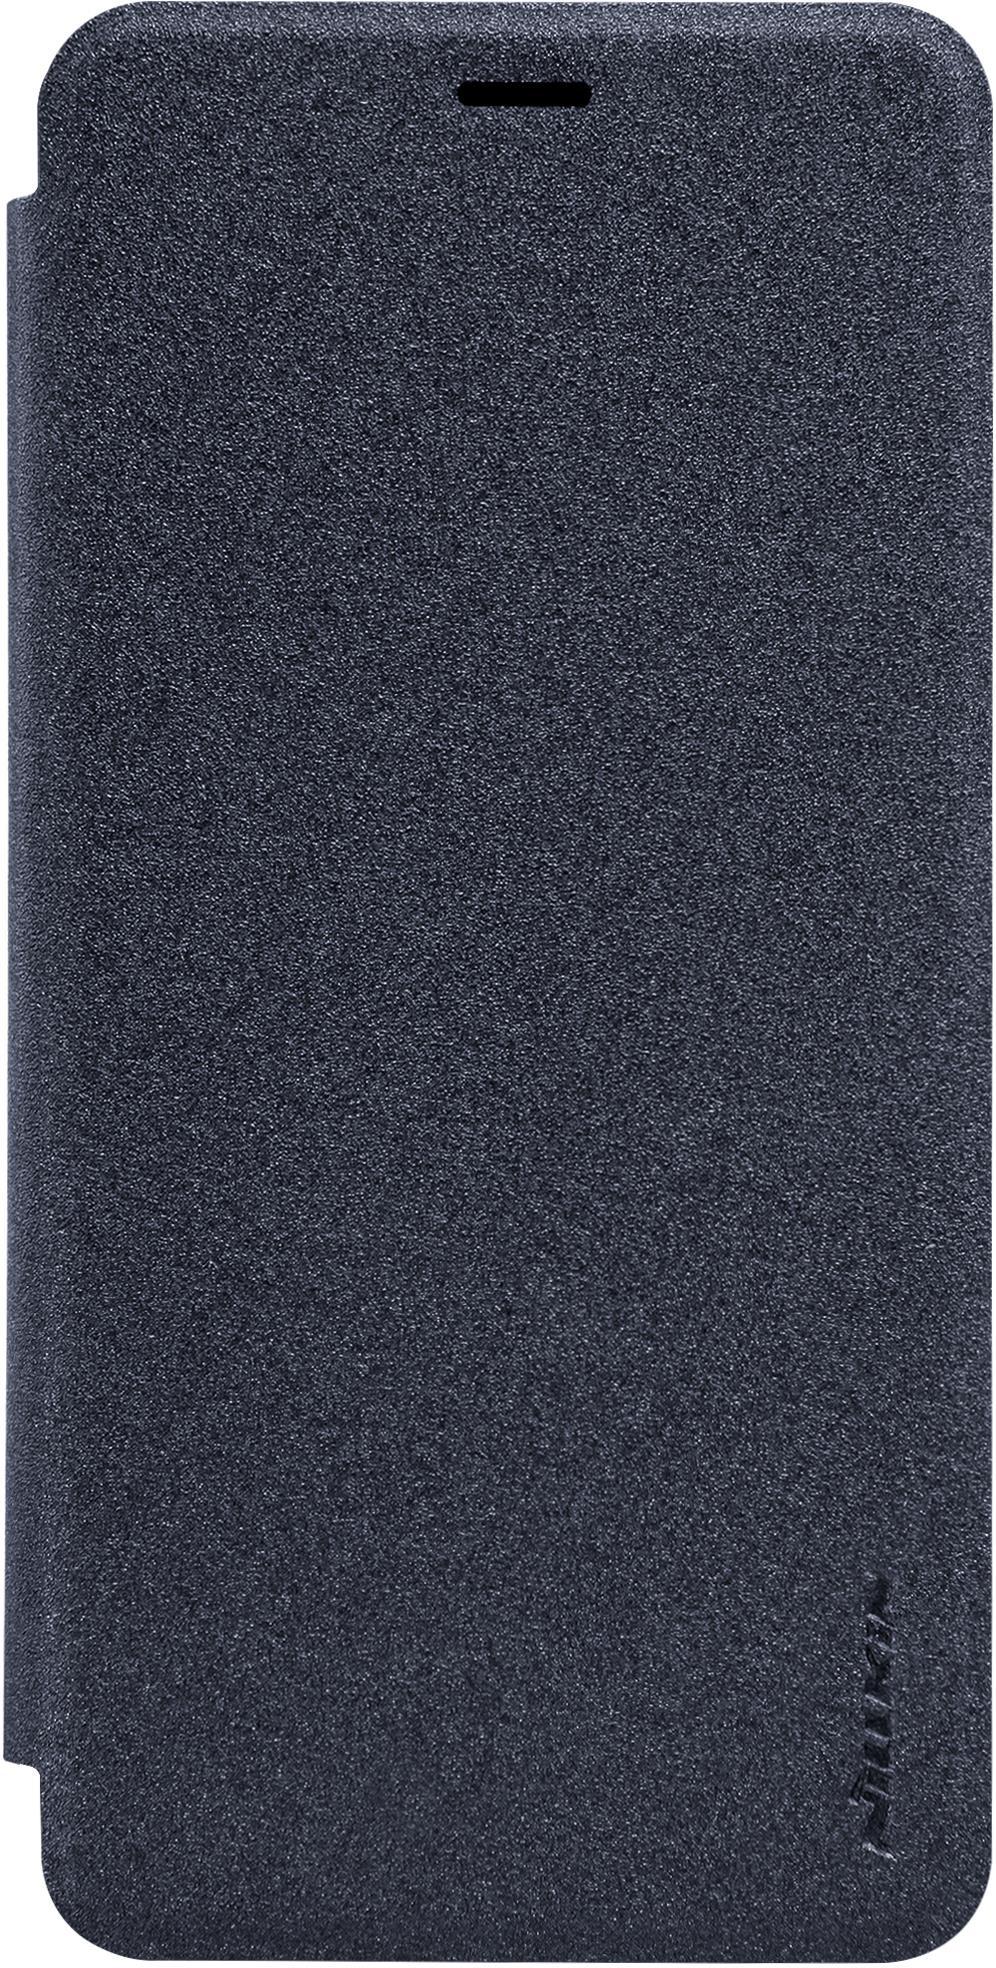 Чехол Nillkin Sparkle для Meizu M5, 6902048133563, серый чехол для meizu m5 gecko flip белый